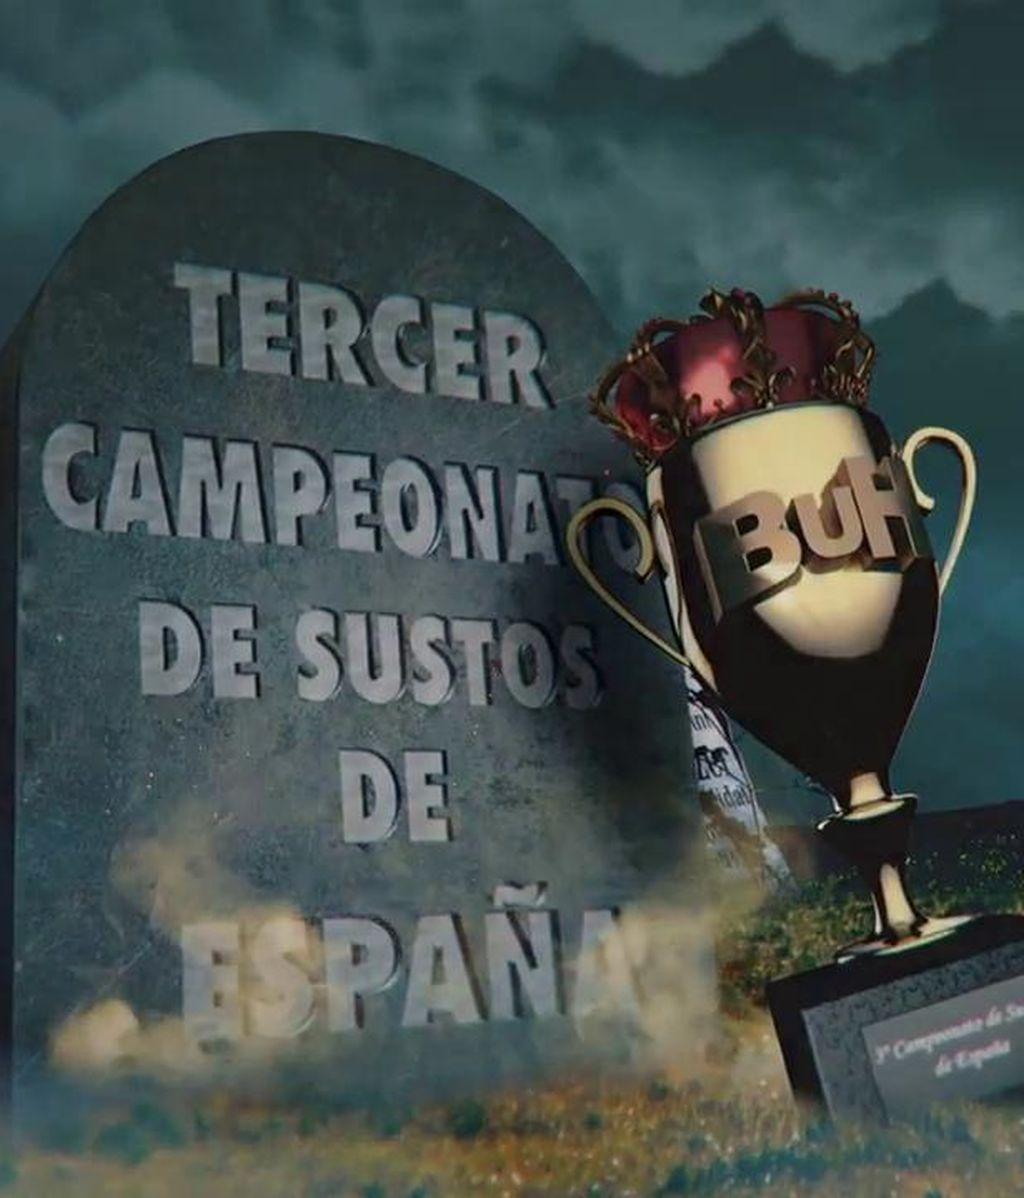 Tercer Campeonato de sustos de Dani&Flo